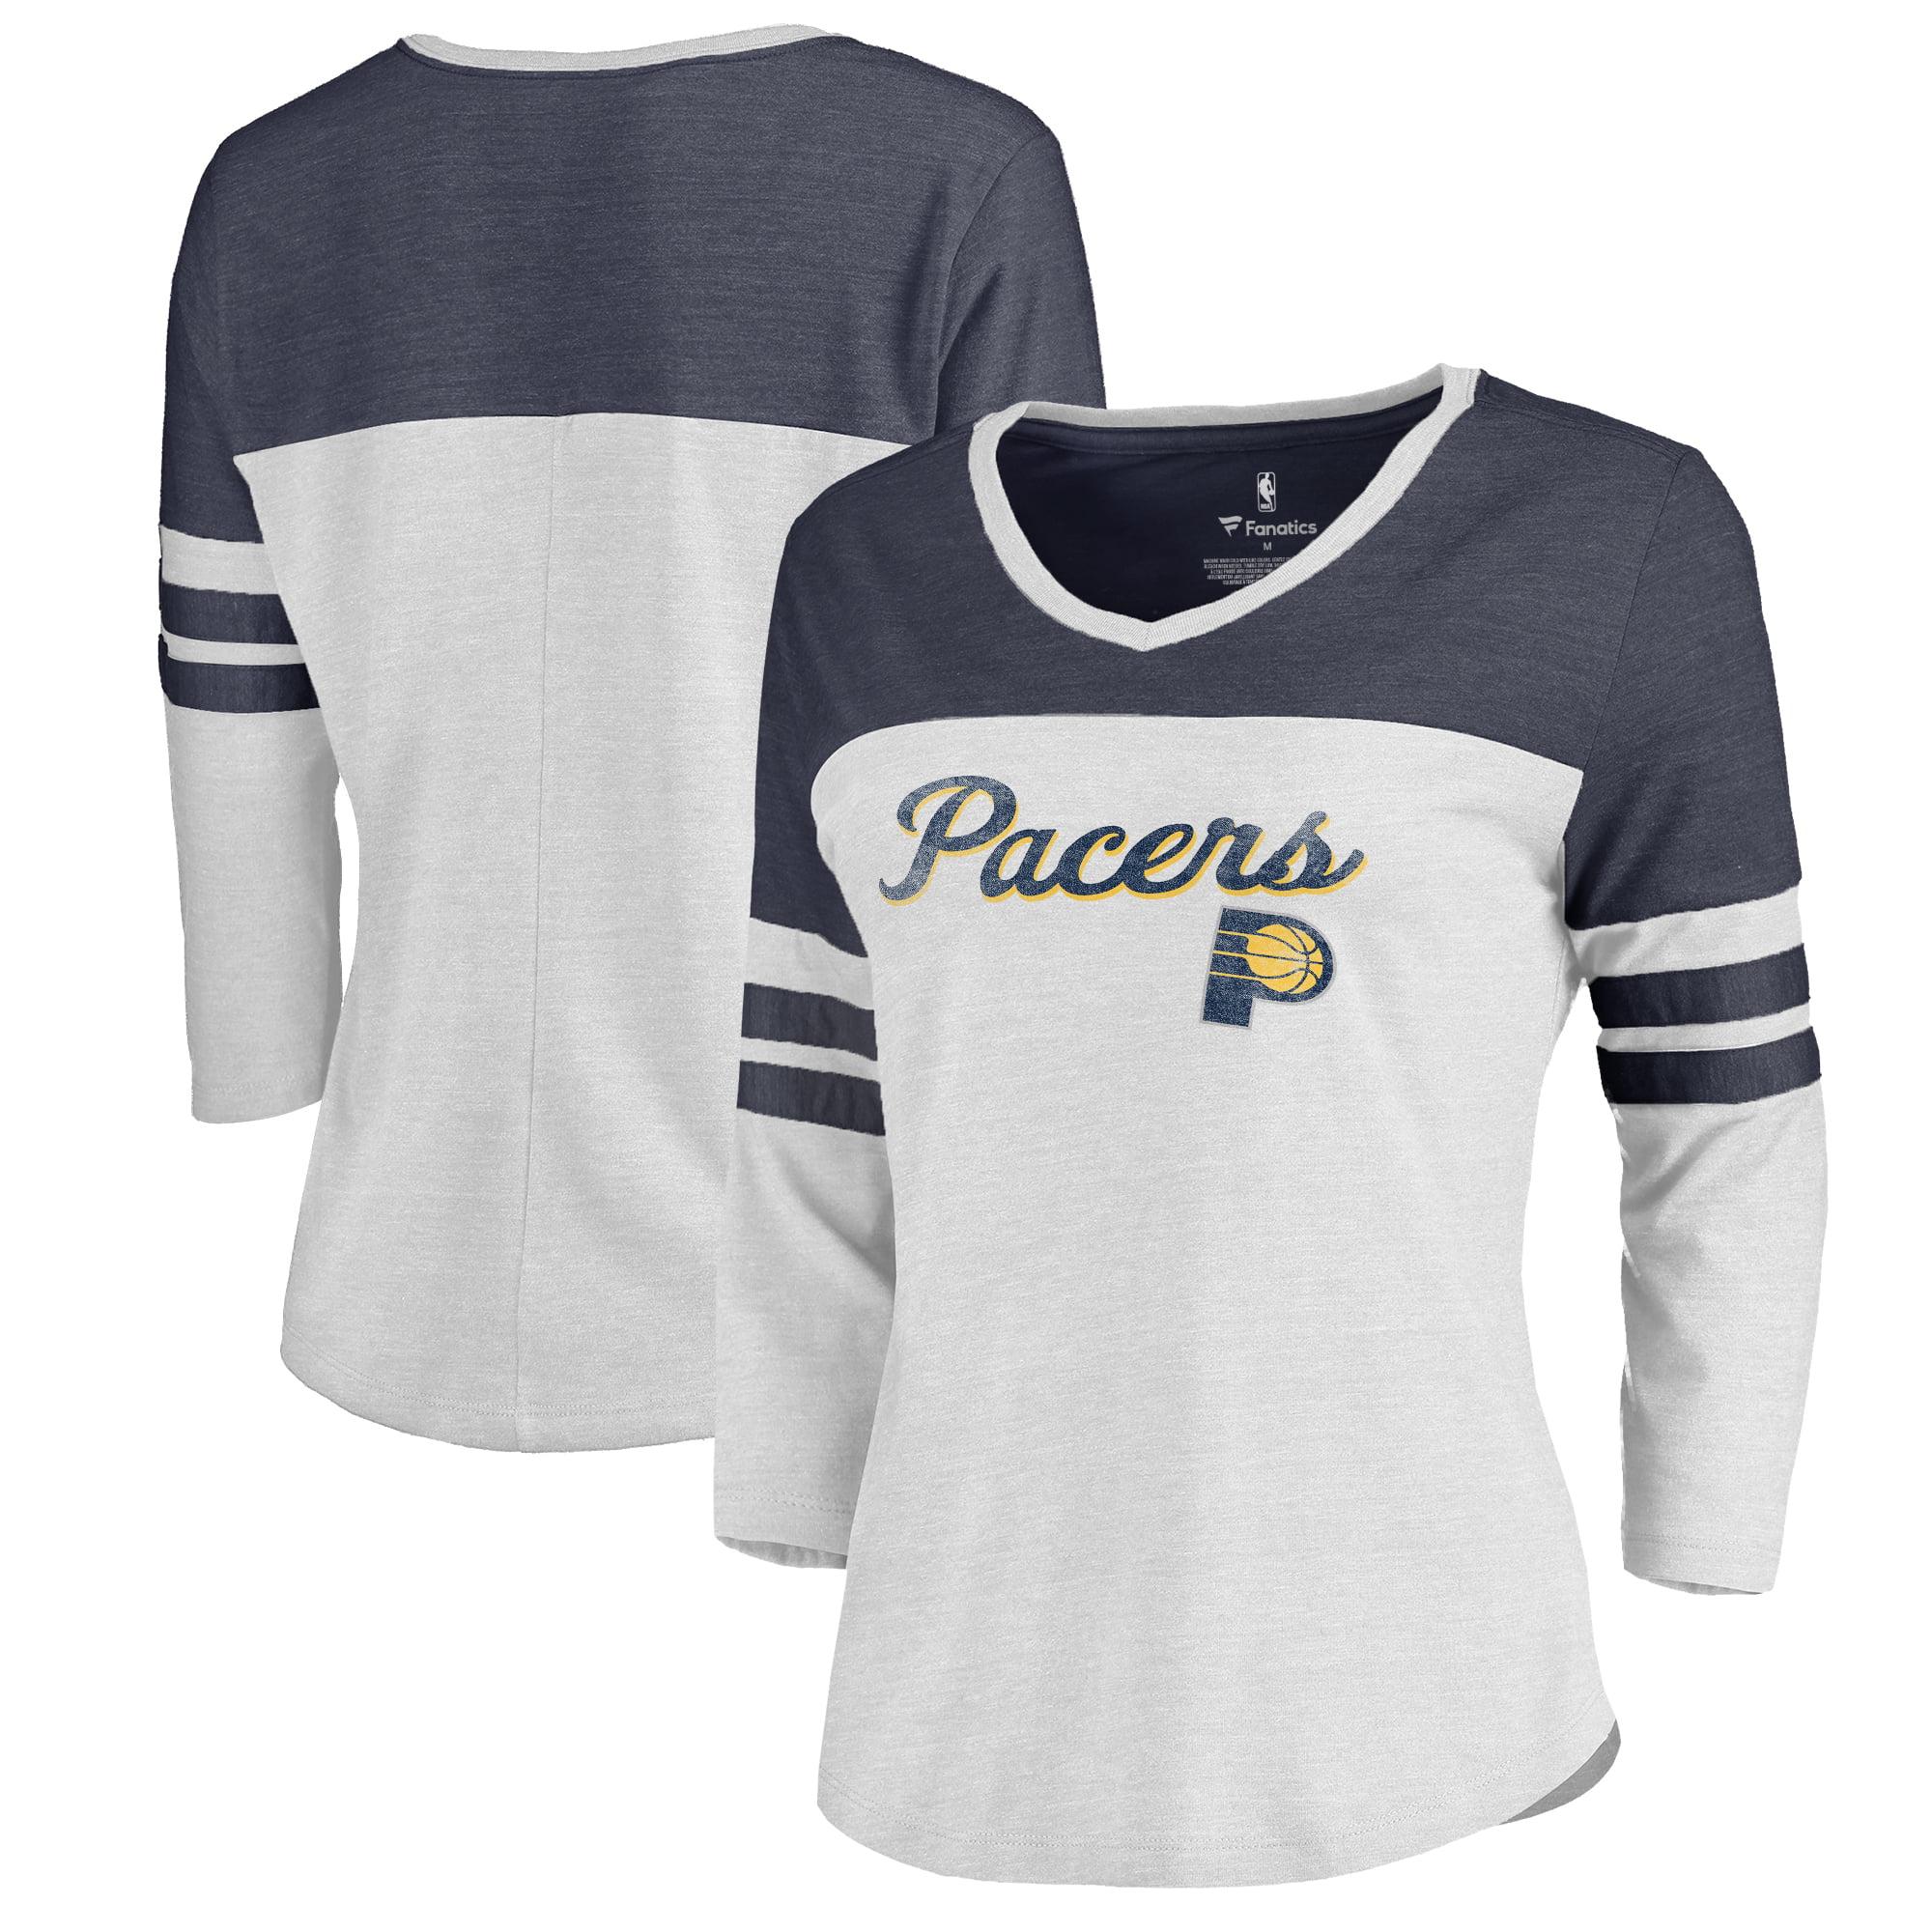 Indiana Pacers Fanatics Branded Women's Rising Script Plus Size Color Block 3/4 Sleeve Tri-Blend T-Shirt - White